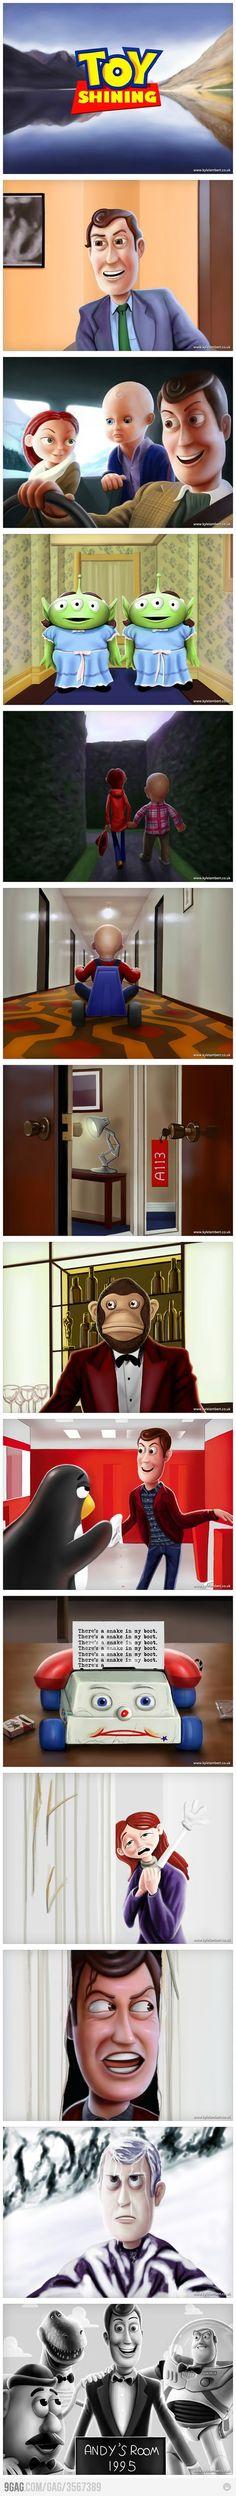 Toy Story + The Shining= Toy Shining